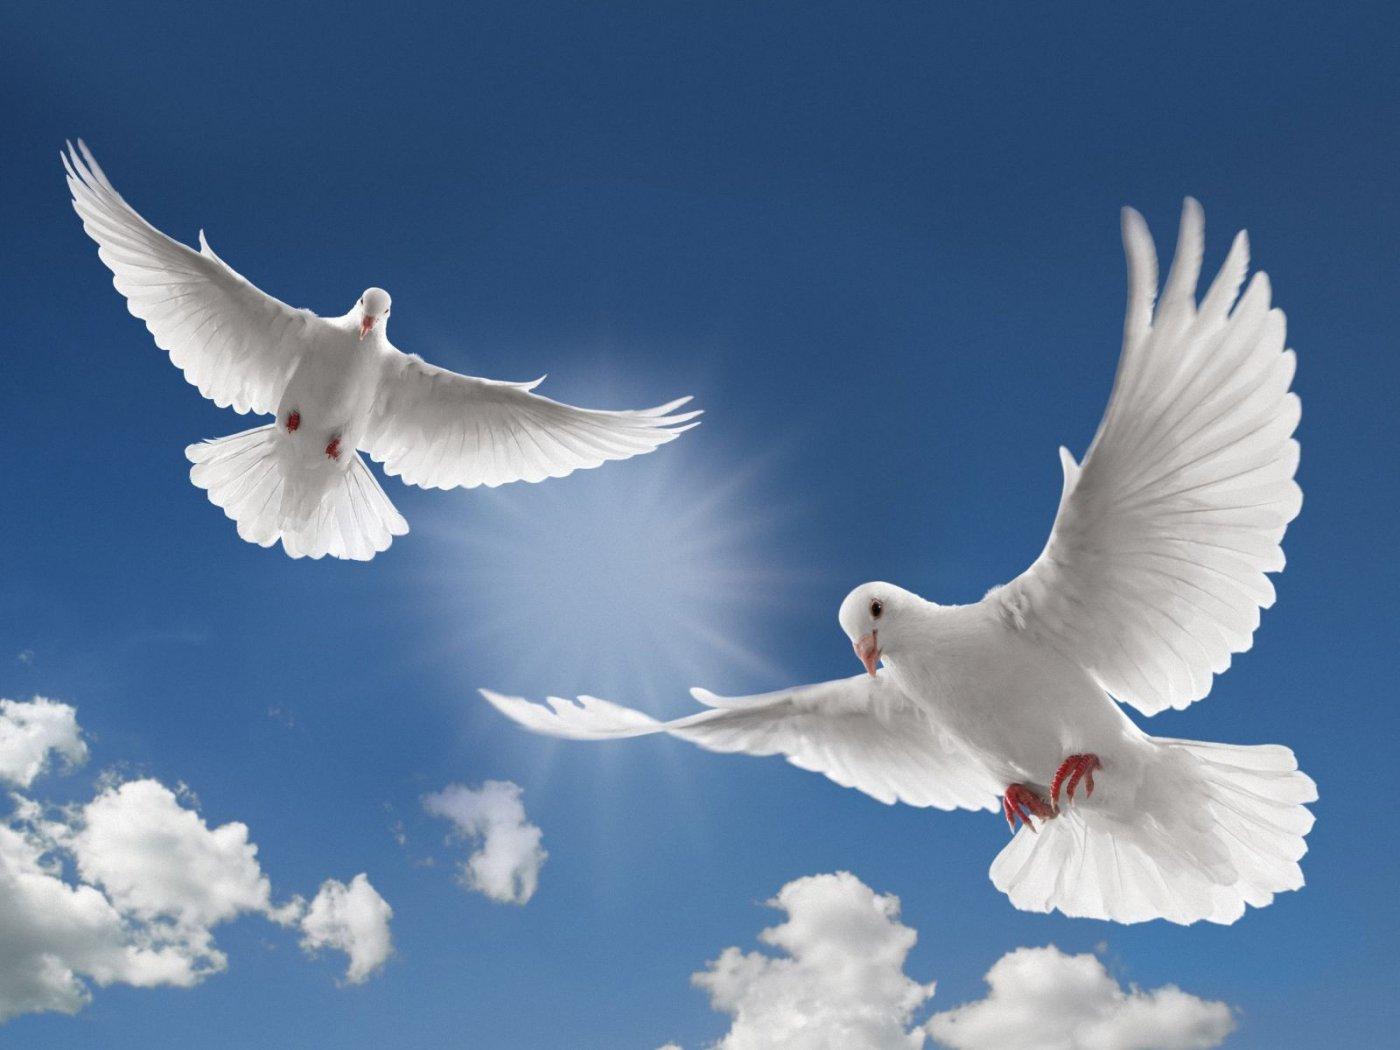 Fancy-Pictures-Of-White-Doves-Flying.jpg